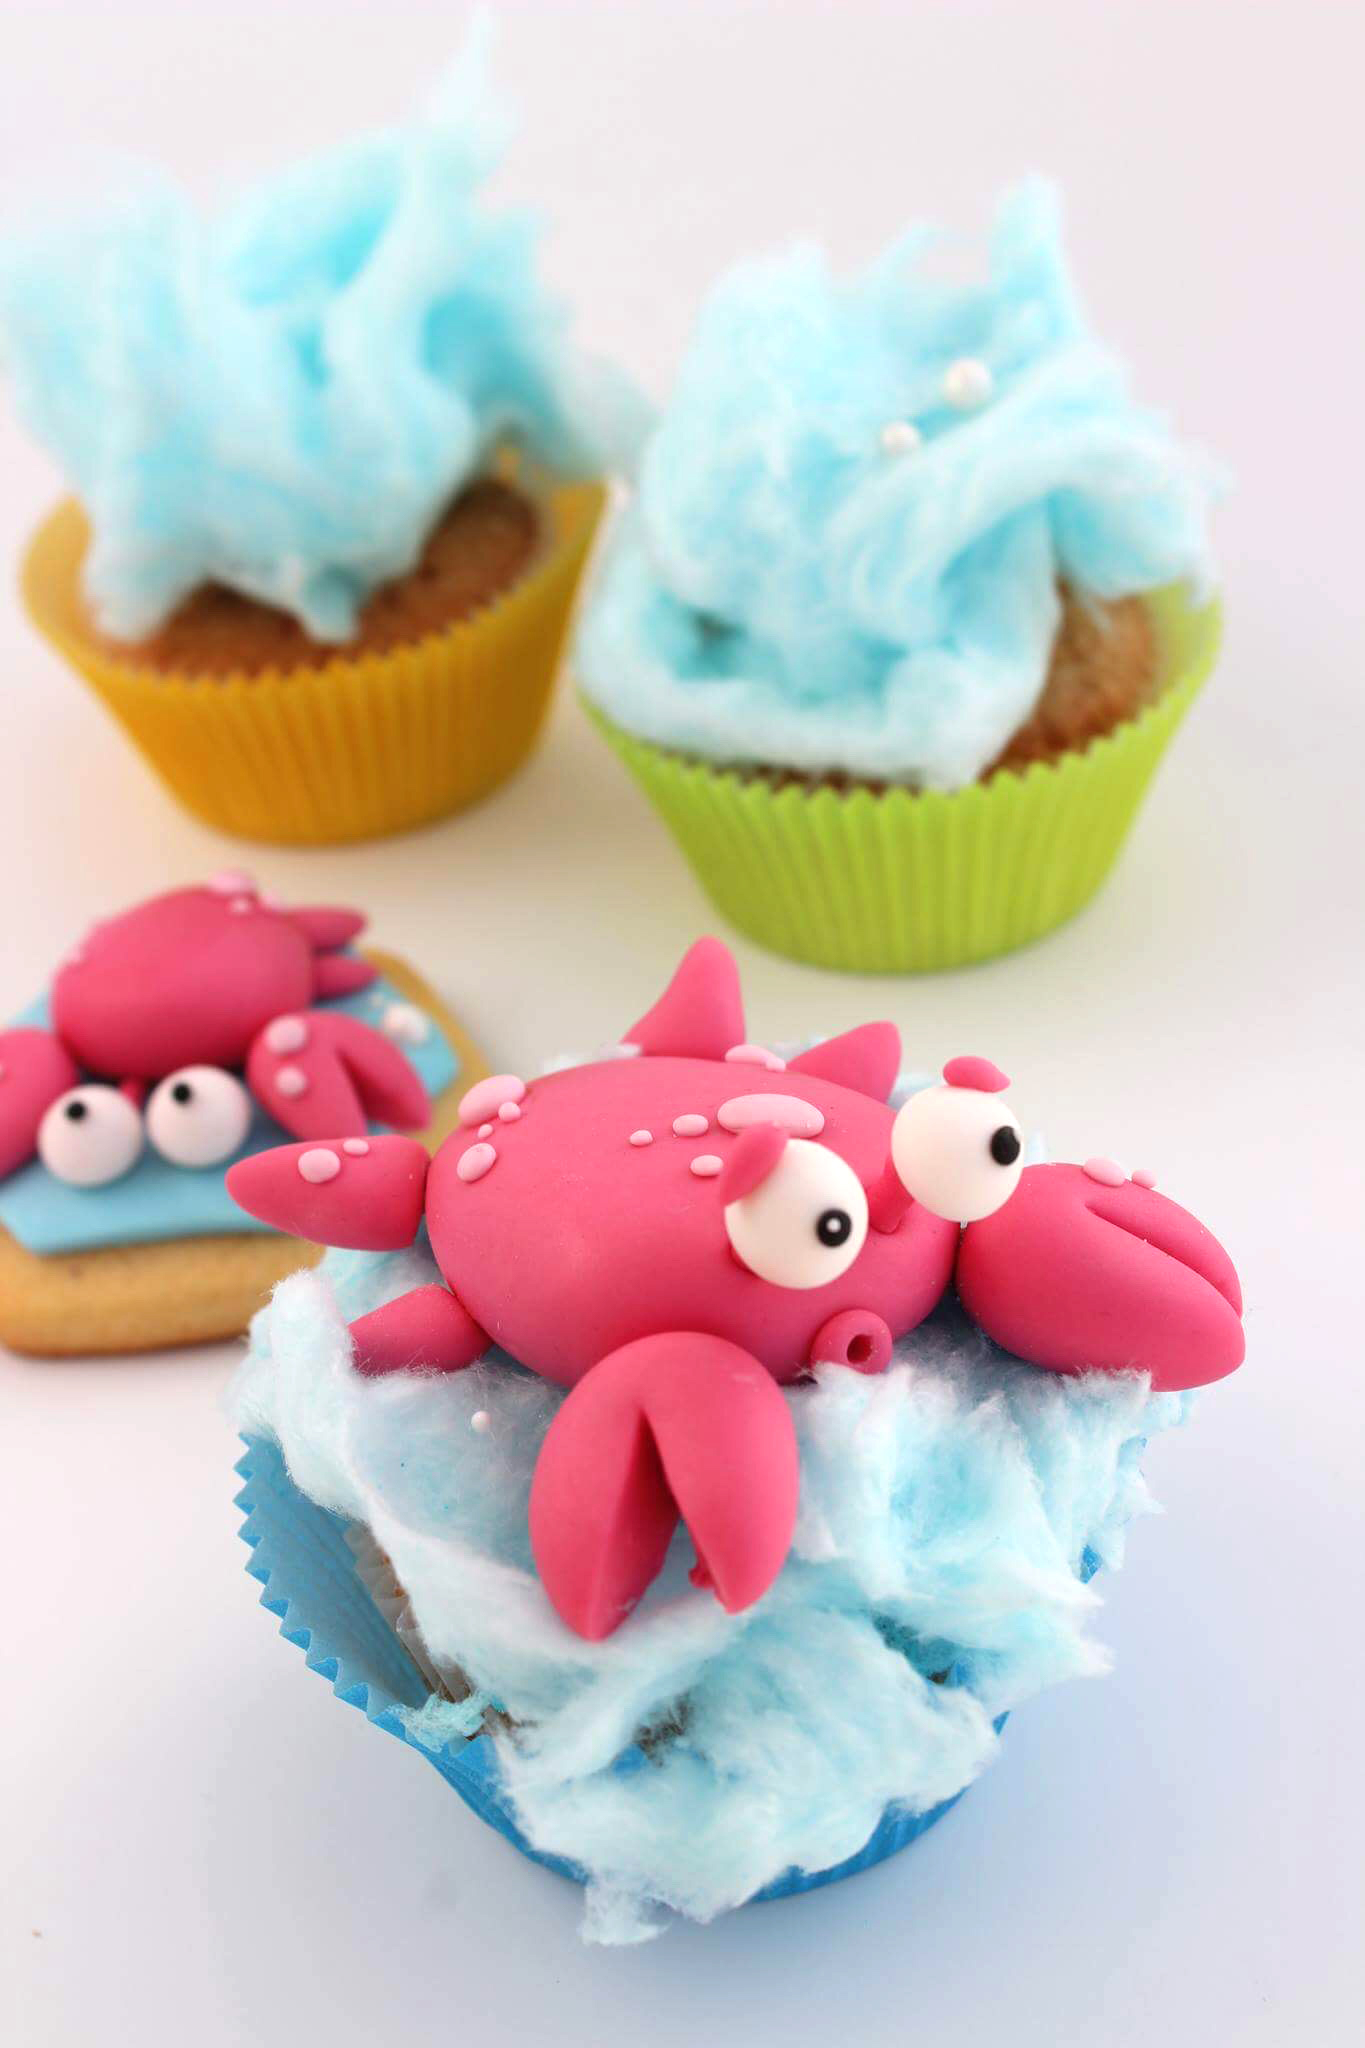 sff17_CrabTutorial-Monique-Ascanelli-The-Cake-Topper-BothHero3.JPG#asset:17060